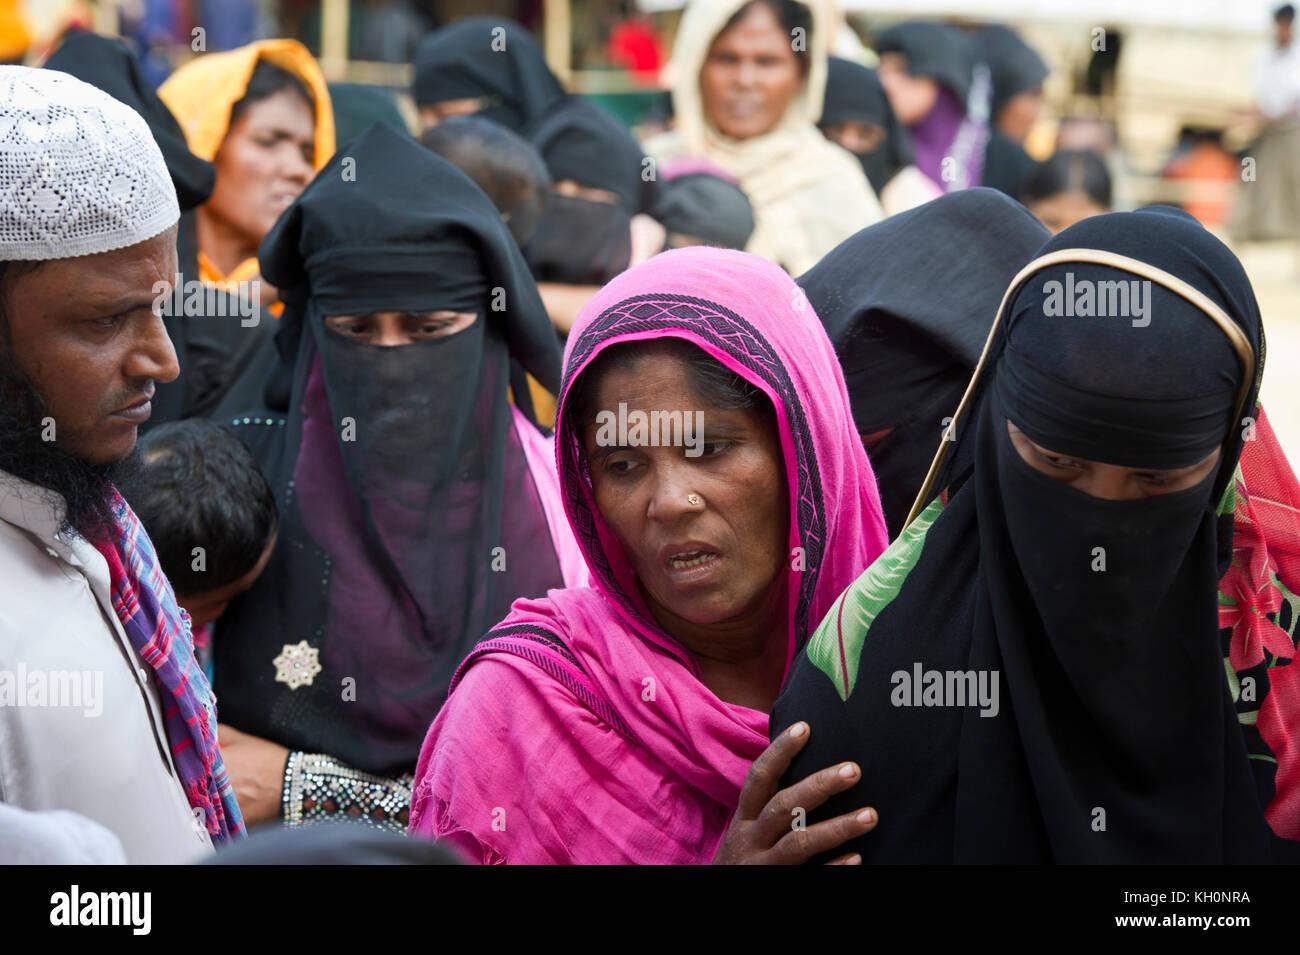 Bangladesch. 11 Nov, 2017. rohingya Flüchtlinge Frau Line up Behandlung unter einer temporären health Stockbild